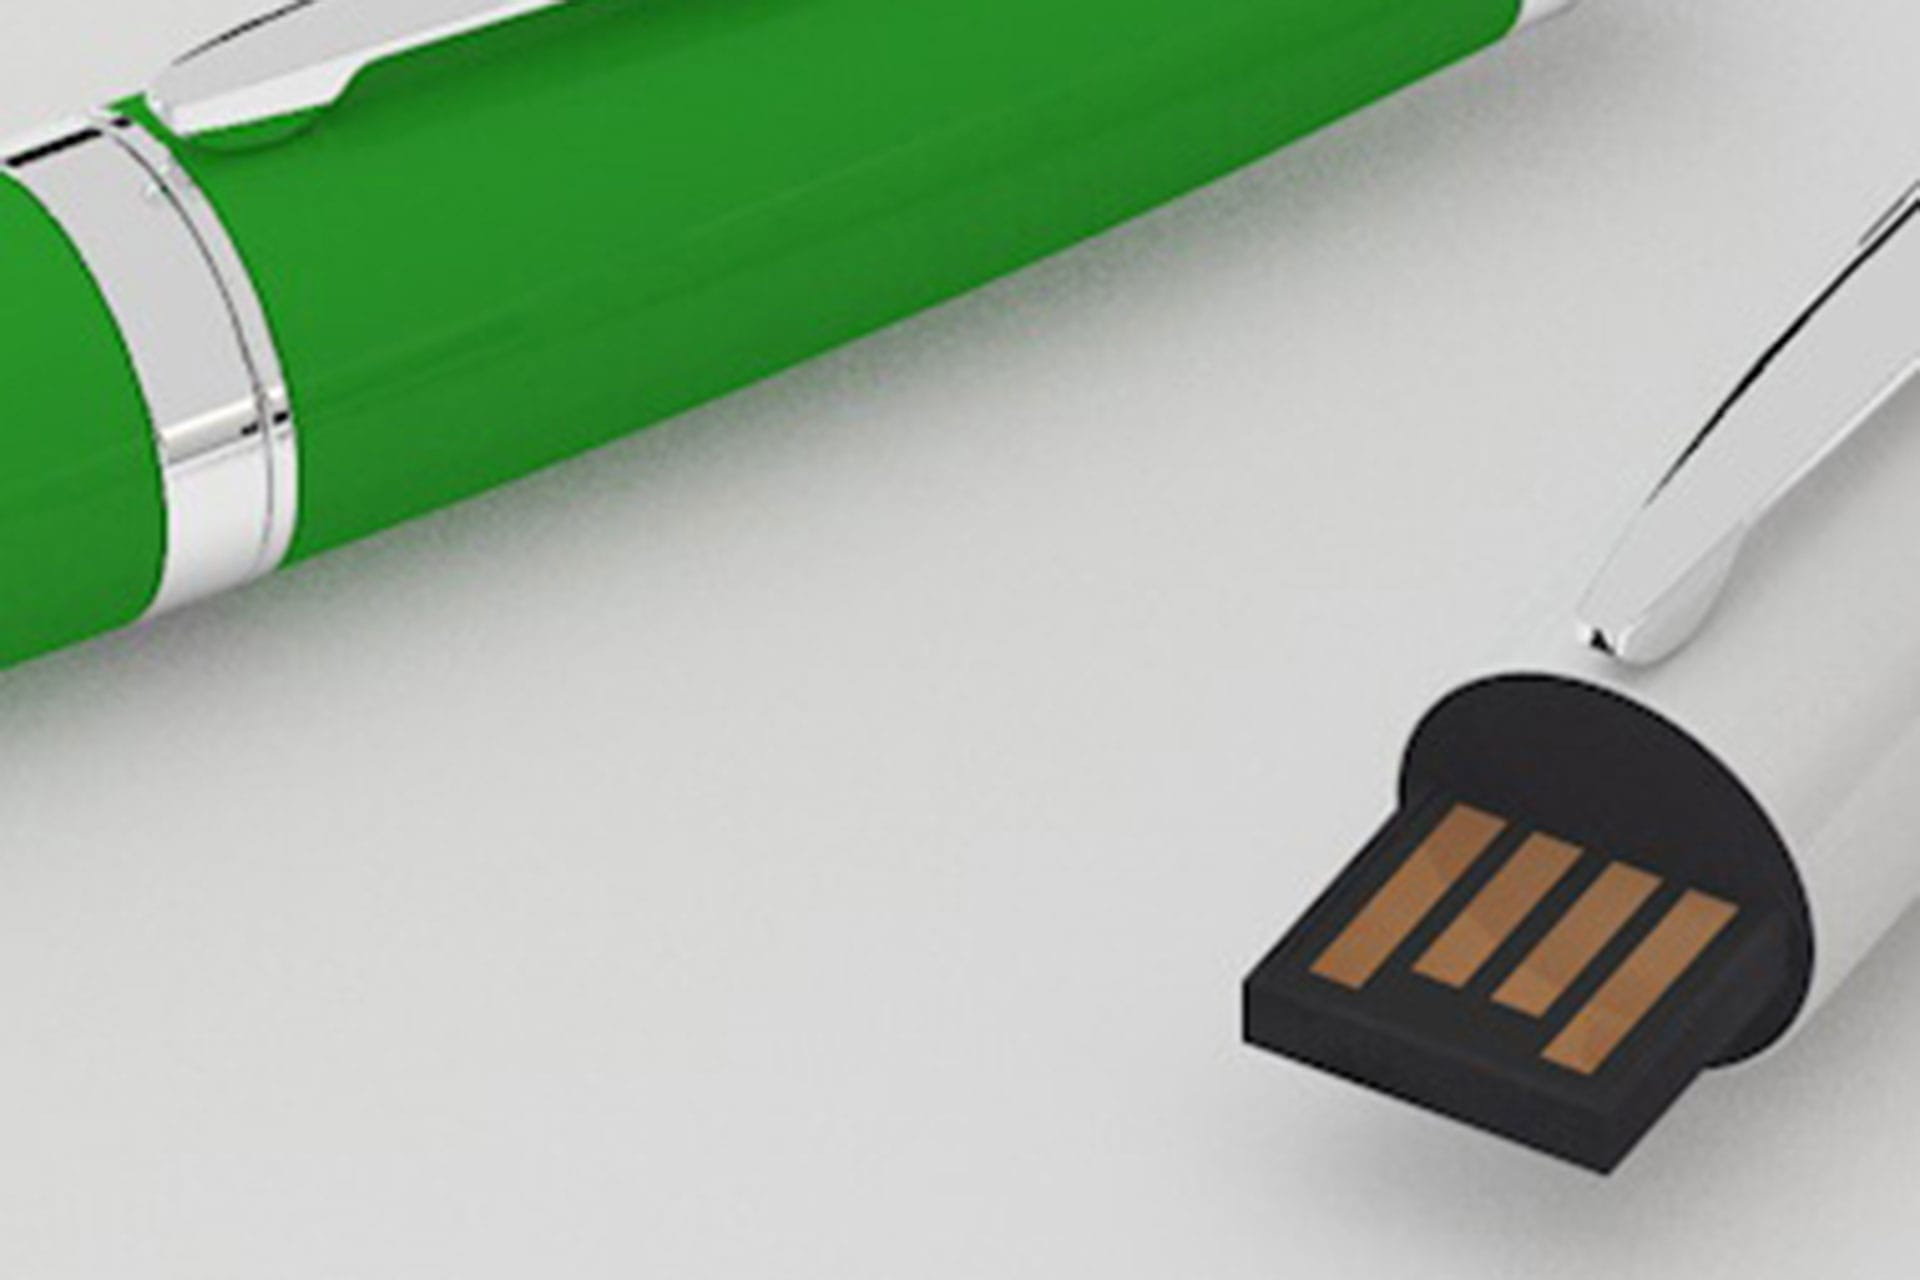 Memoria USB a forma di penna